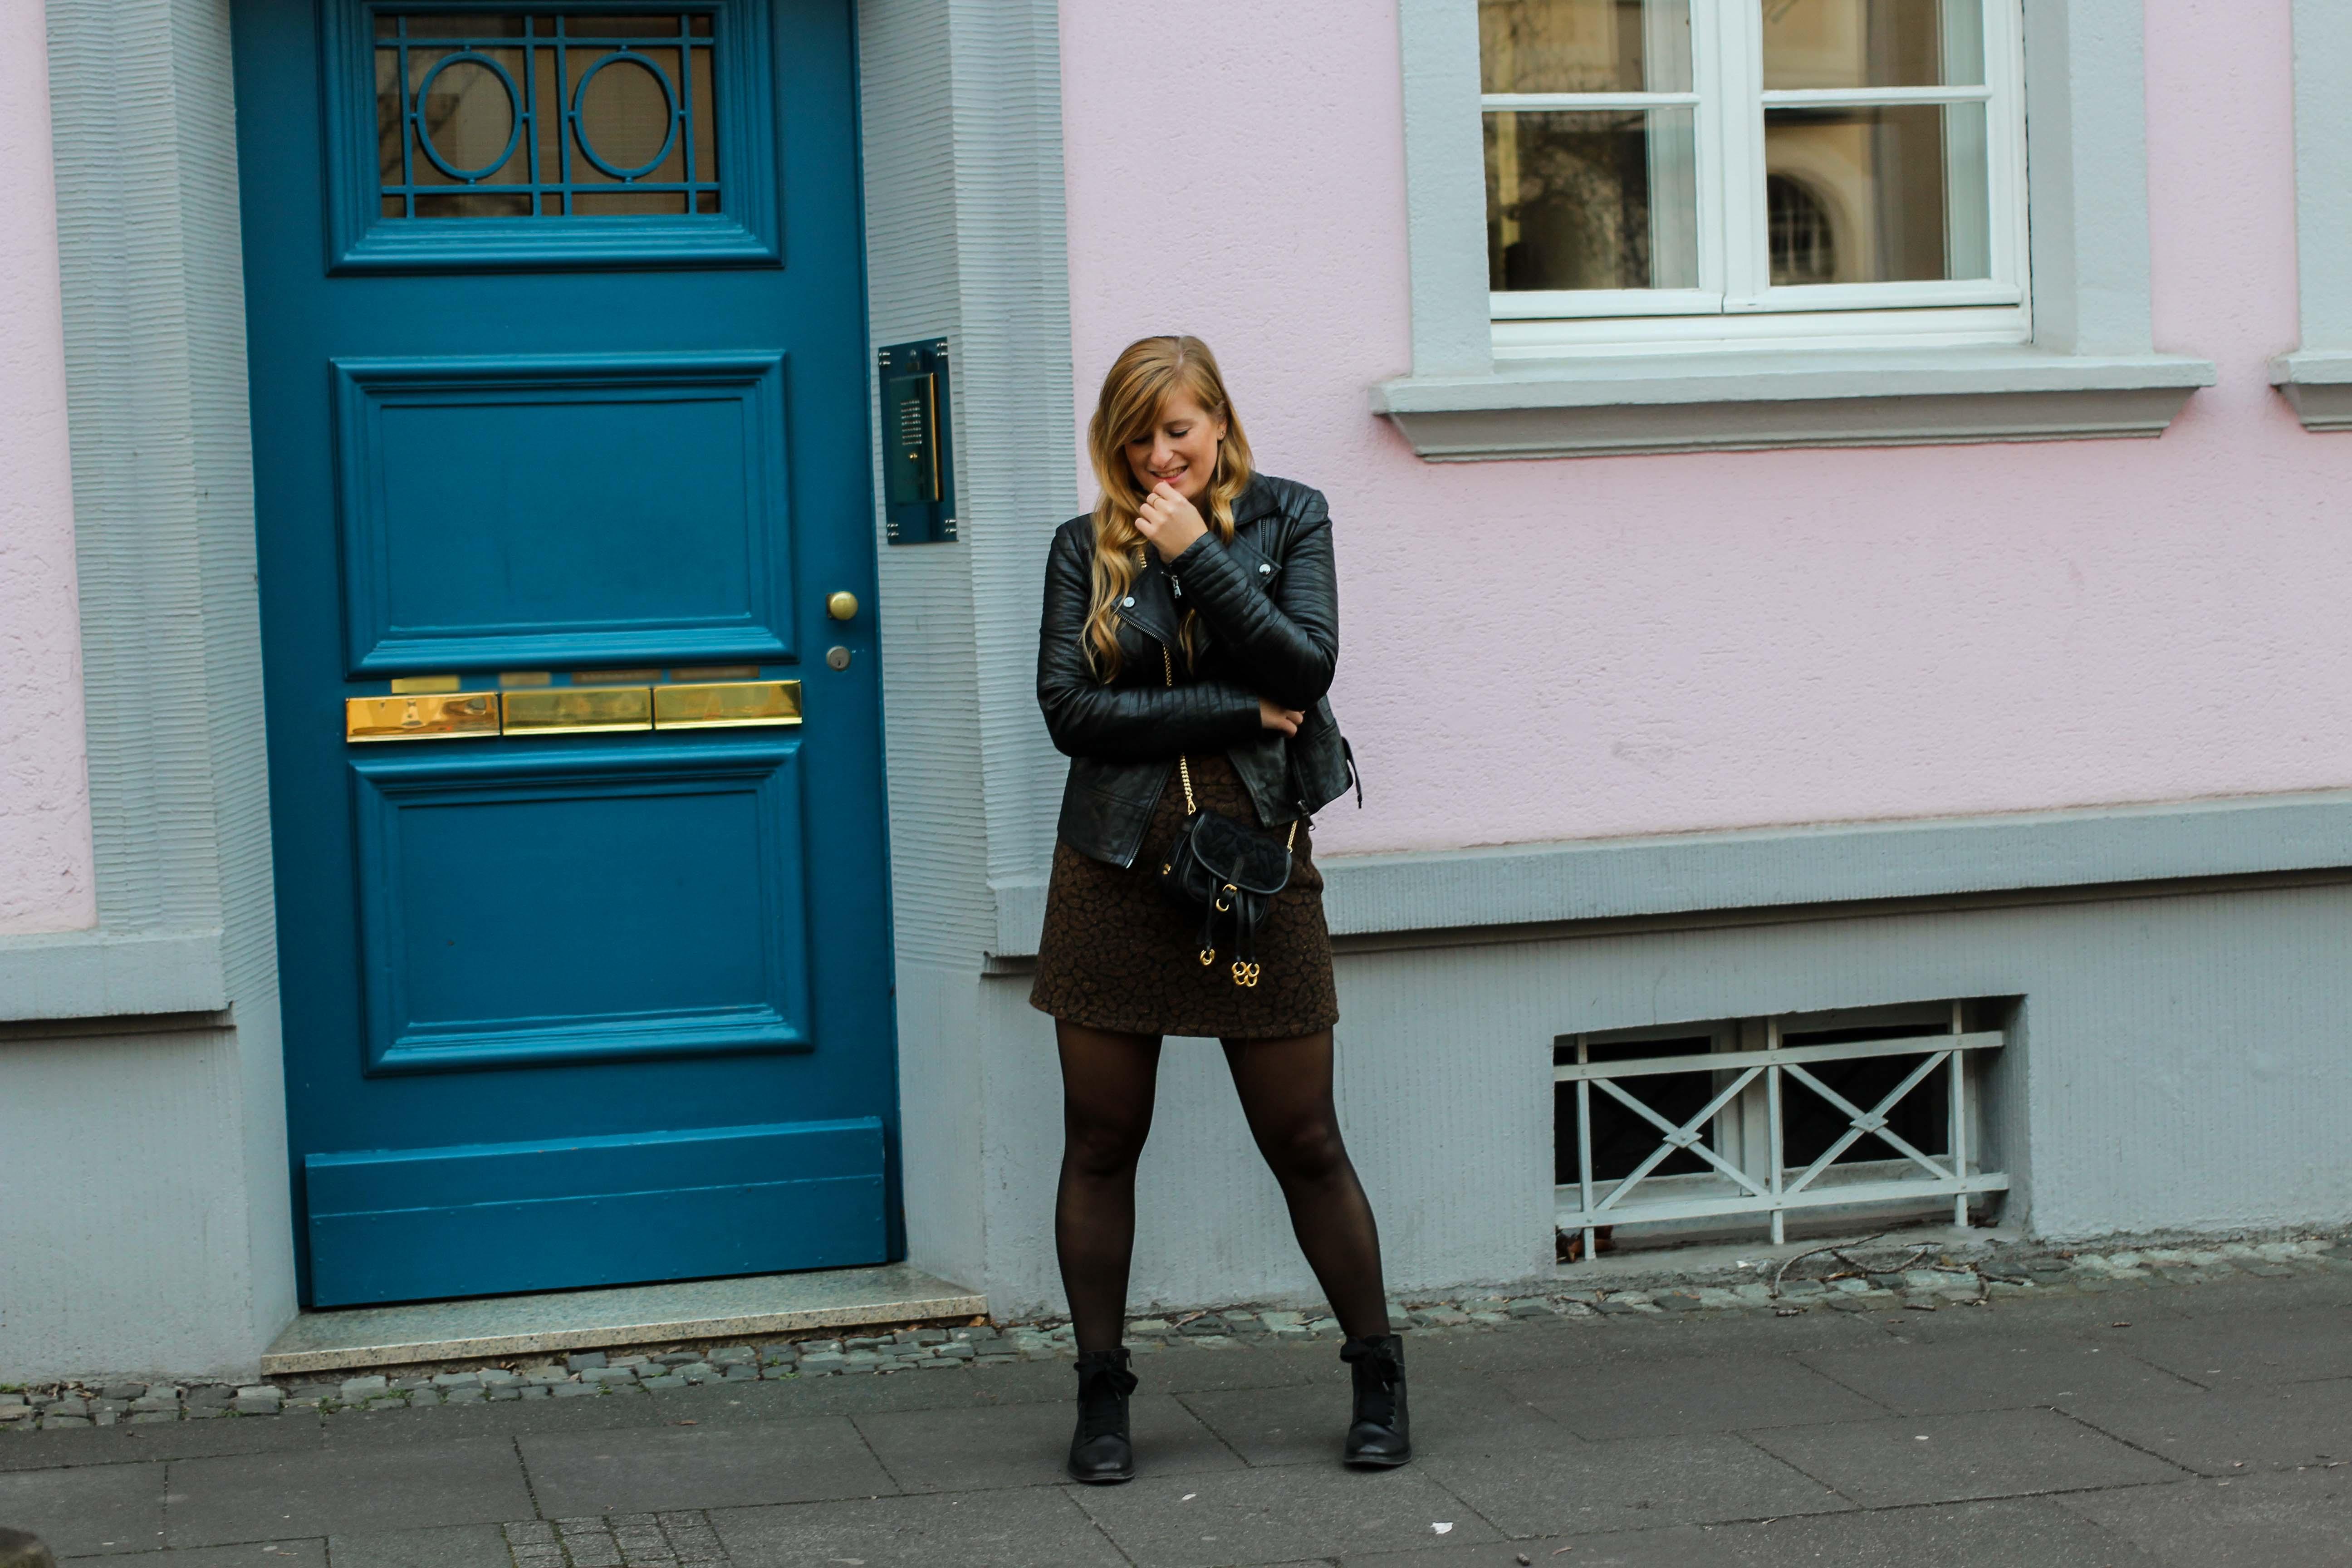 Leo Rock kombinieren Alltag Lederjacke Streetstyle Modeblog Prada Handtasche Stoff Edited Boots Frühling Strumpfhose 3